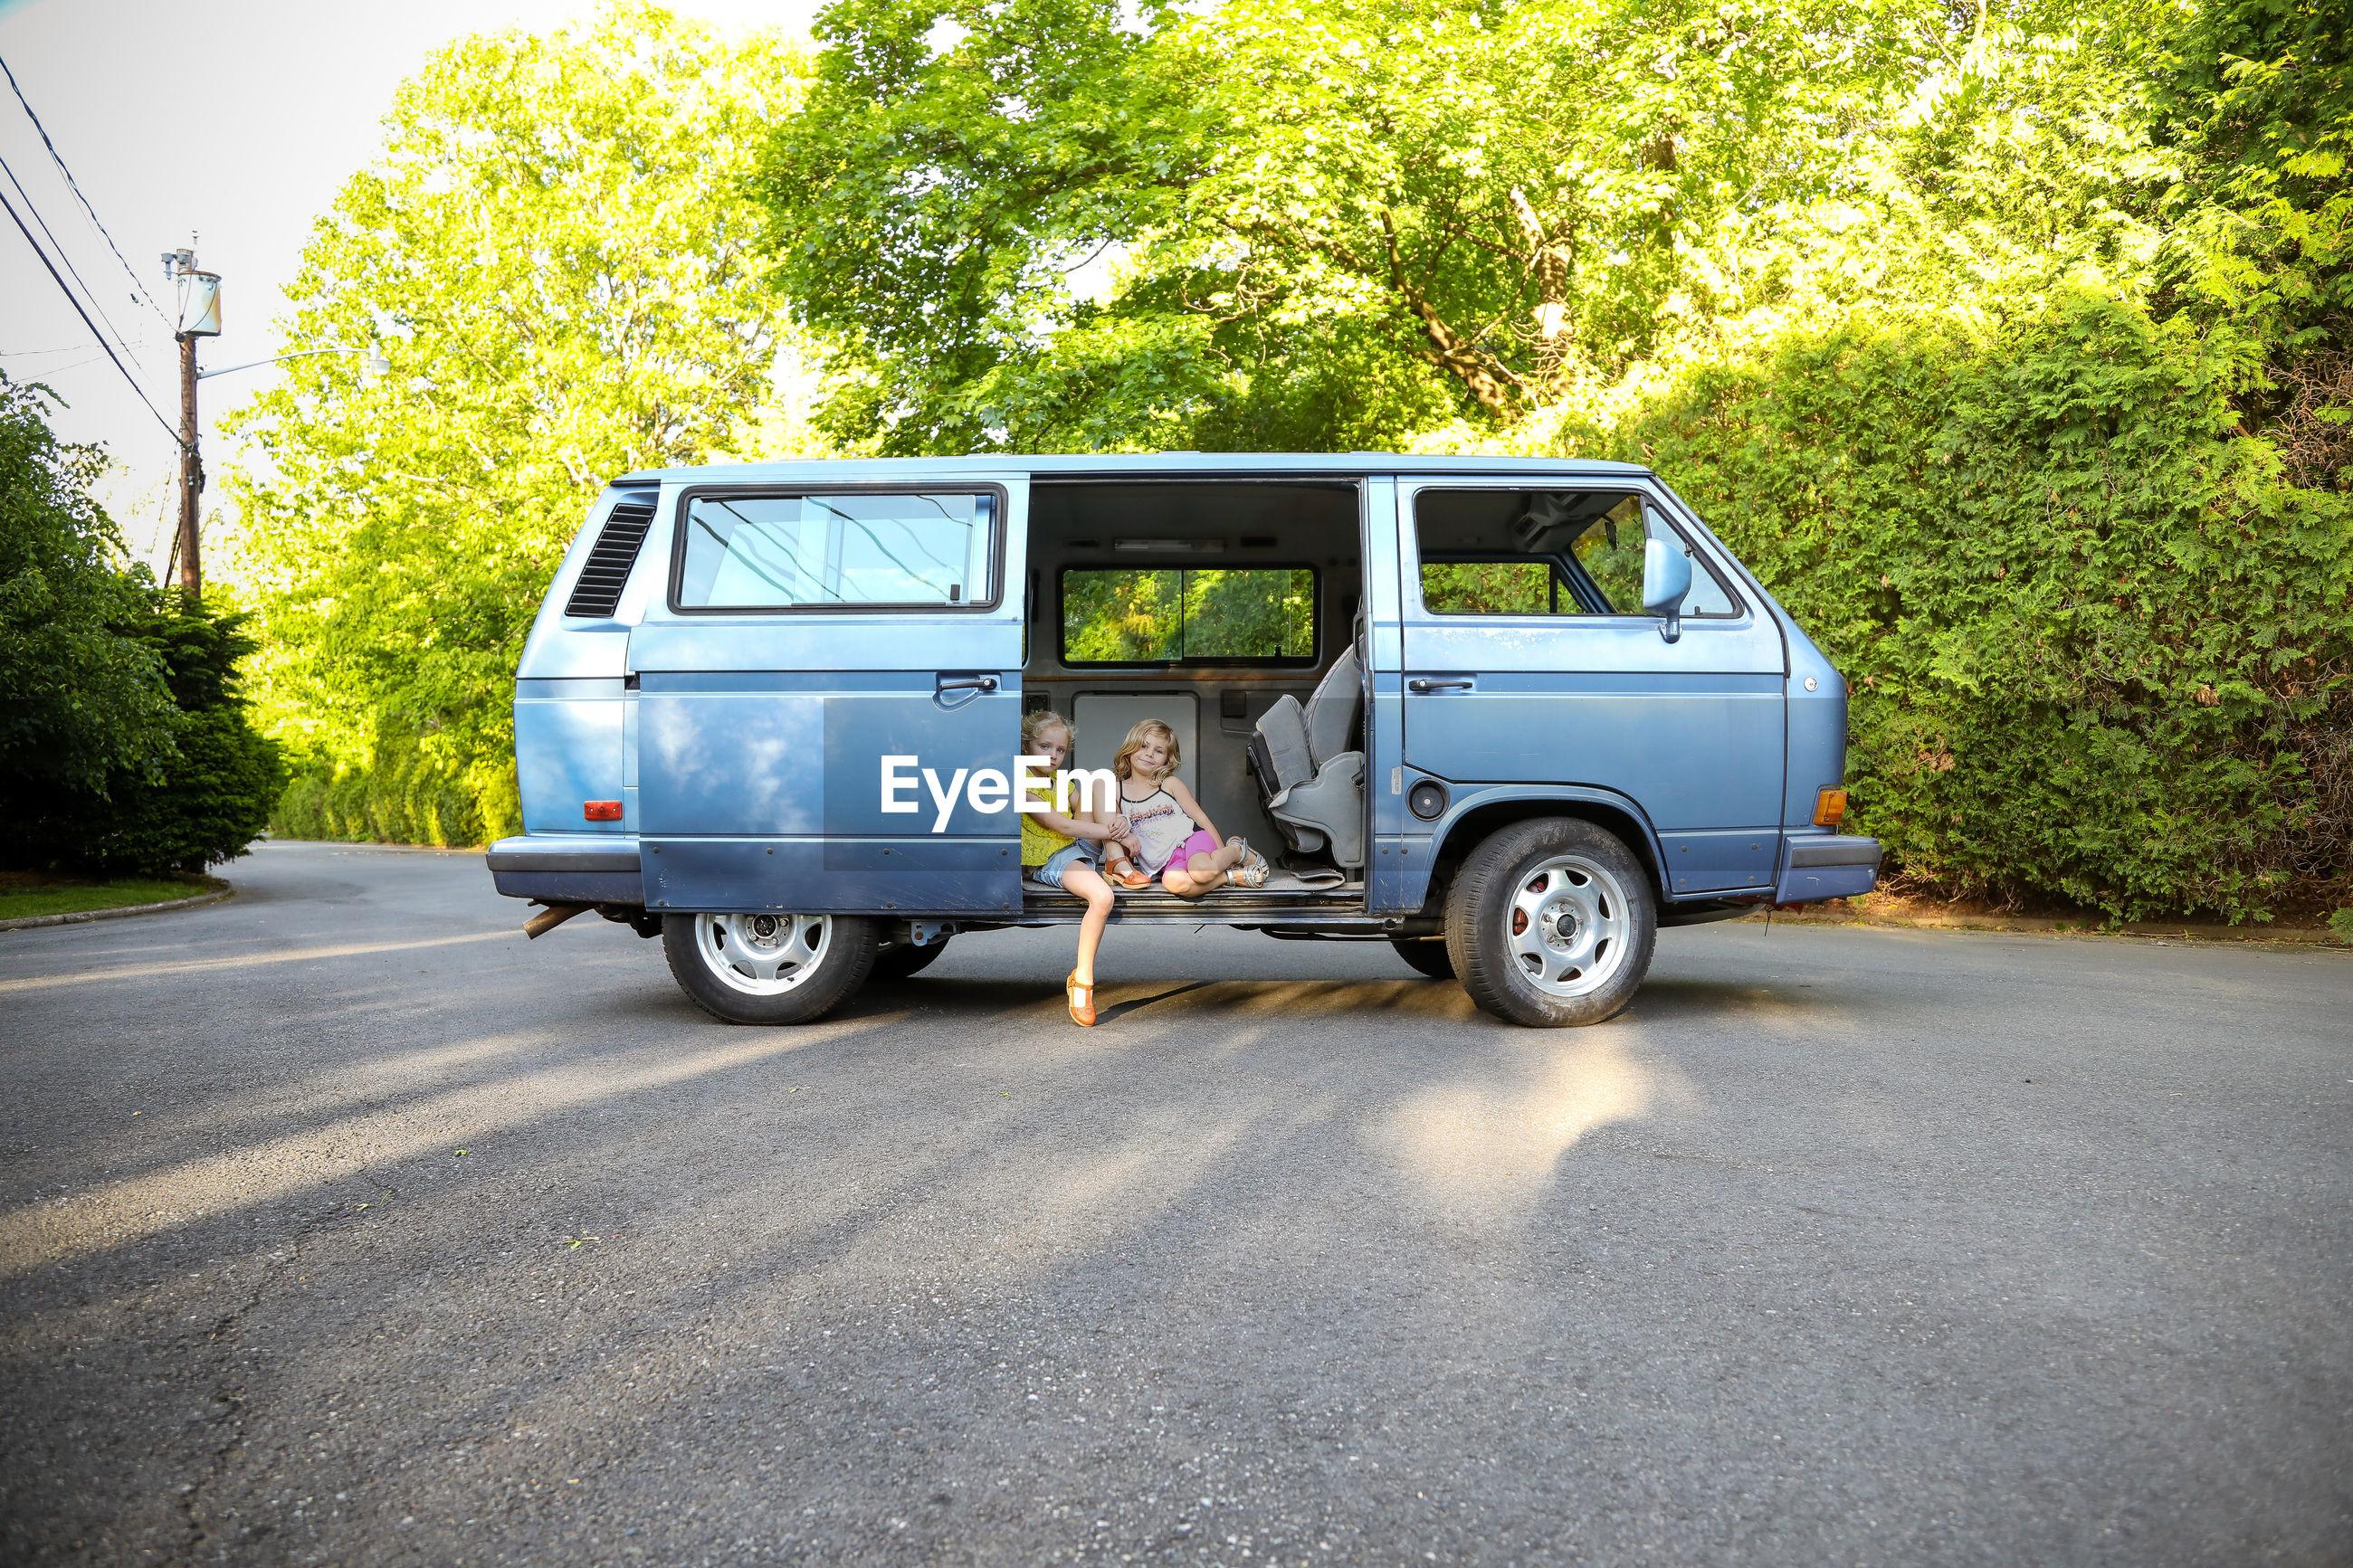 VINTAGE CAR ON ROAD IN PARK